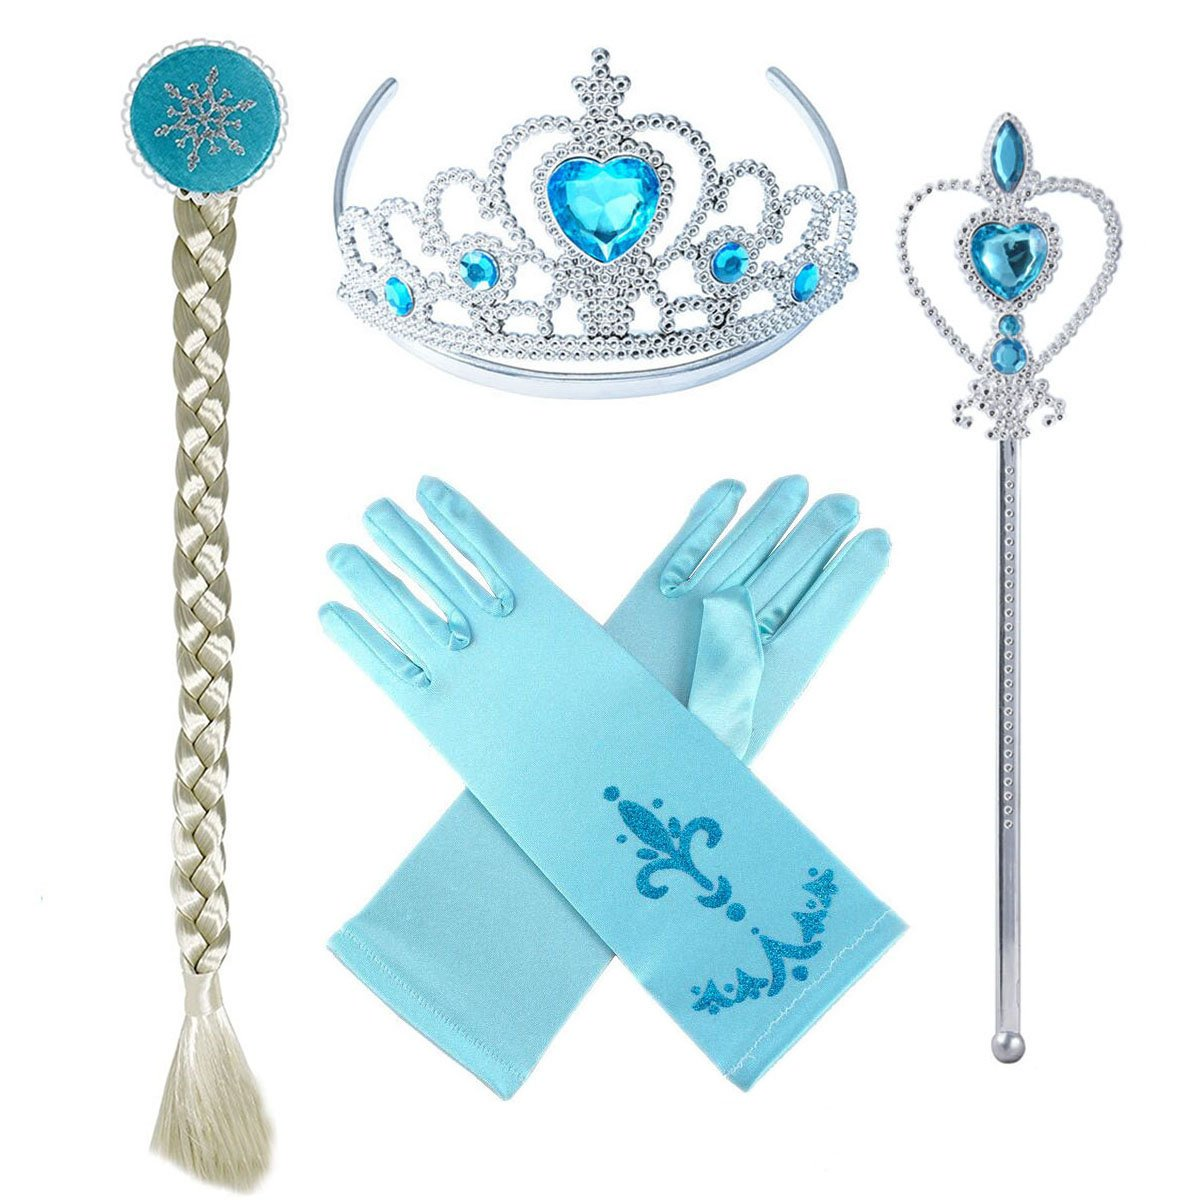 Princess Elsa Dress up Party Accessories Blue Favors 4 Pcs Gifts Set - Gloves Tiara Wig and Wand